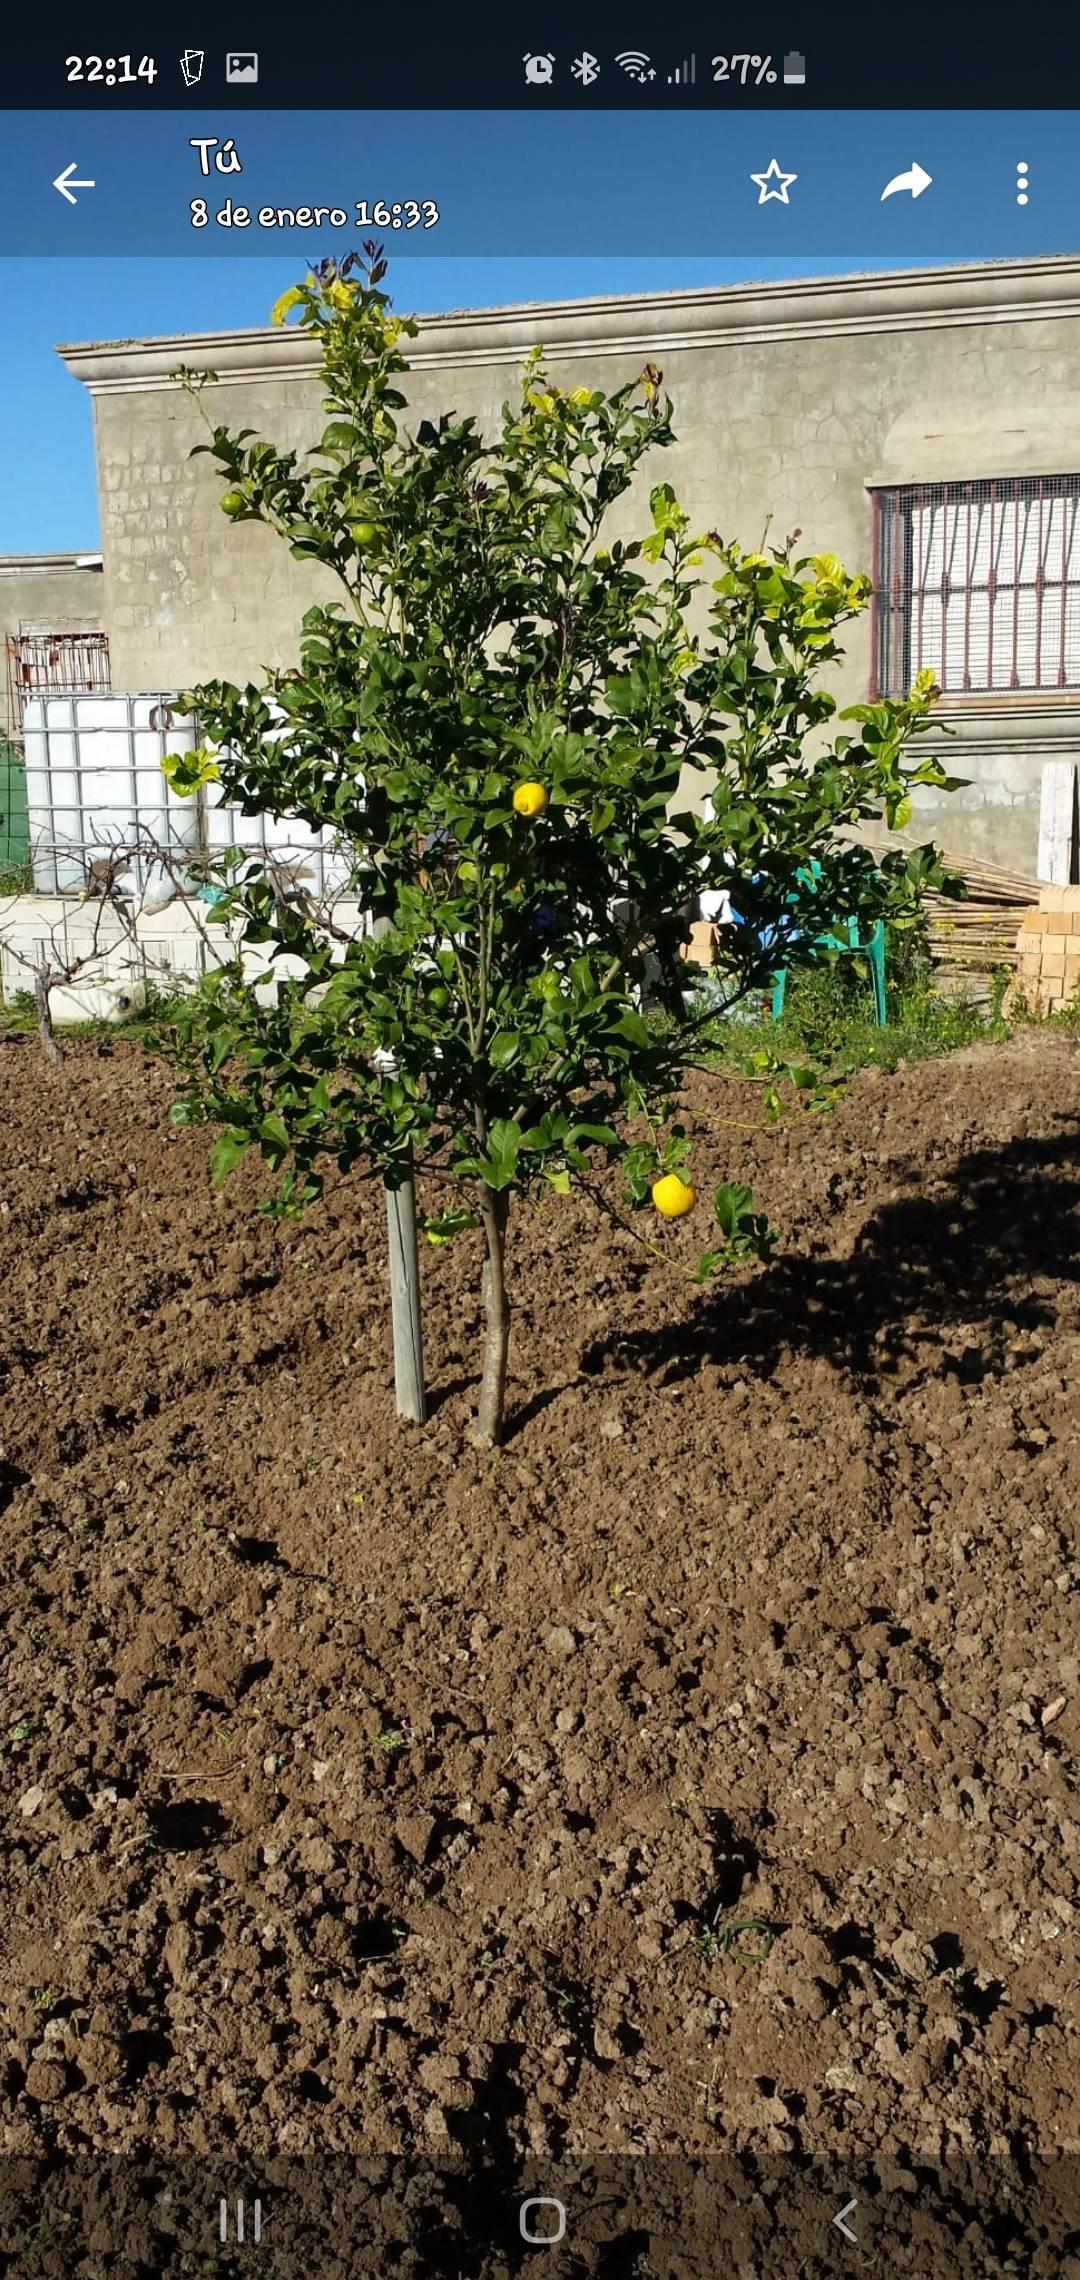 Vendo parcela en Montes de Toledo  - Foto 5